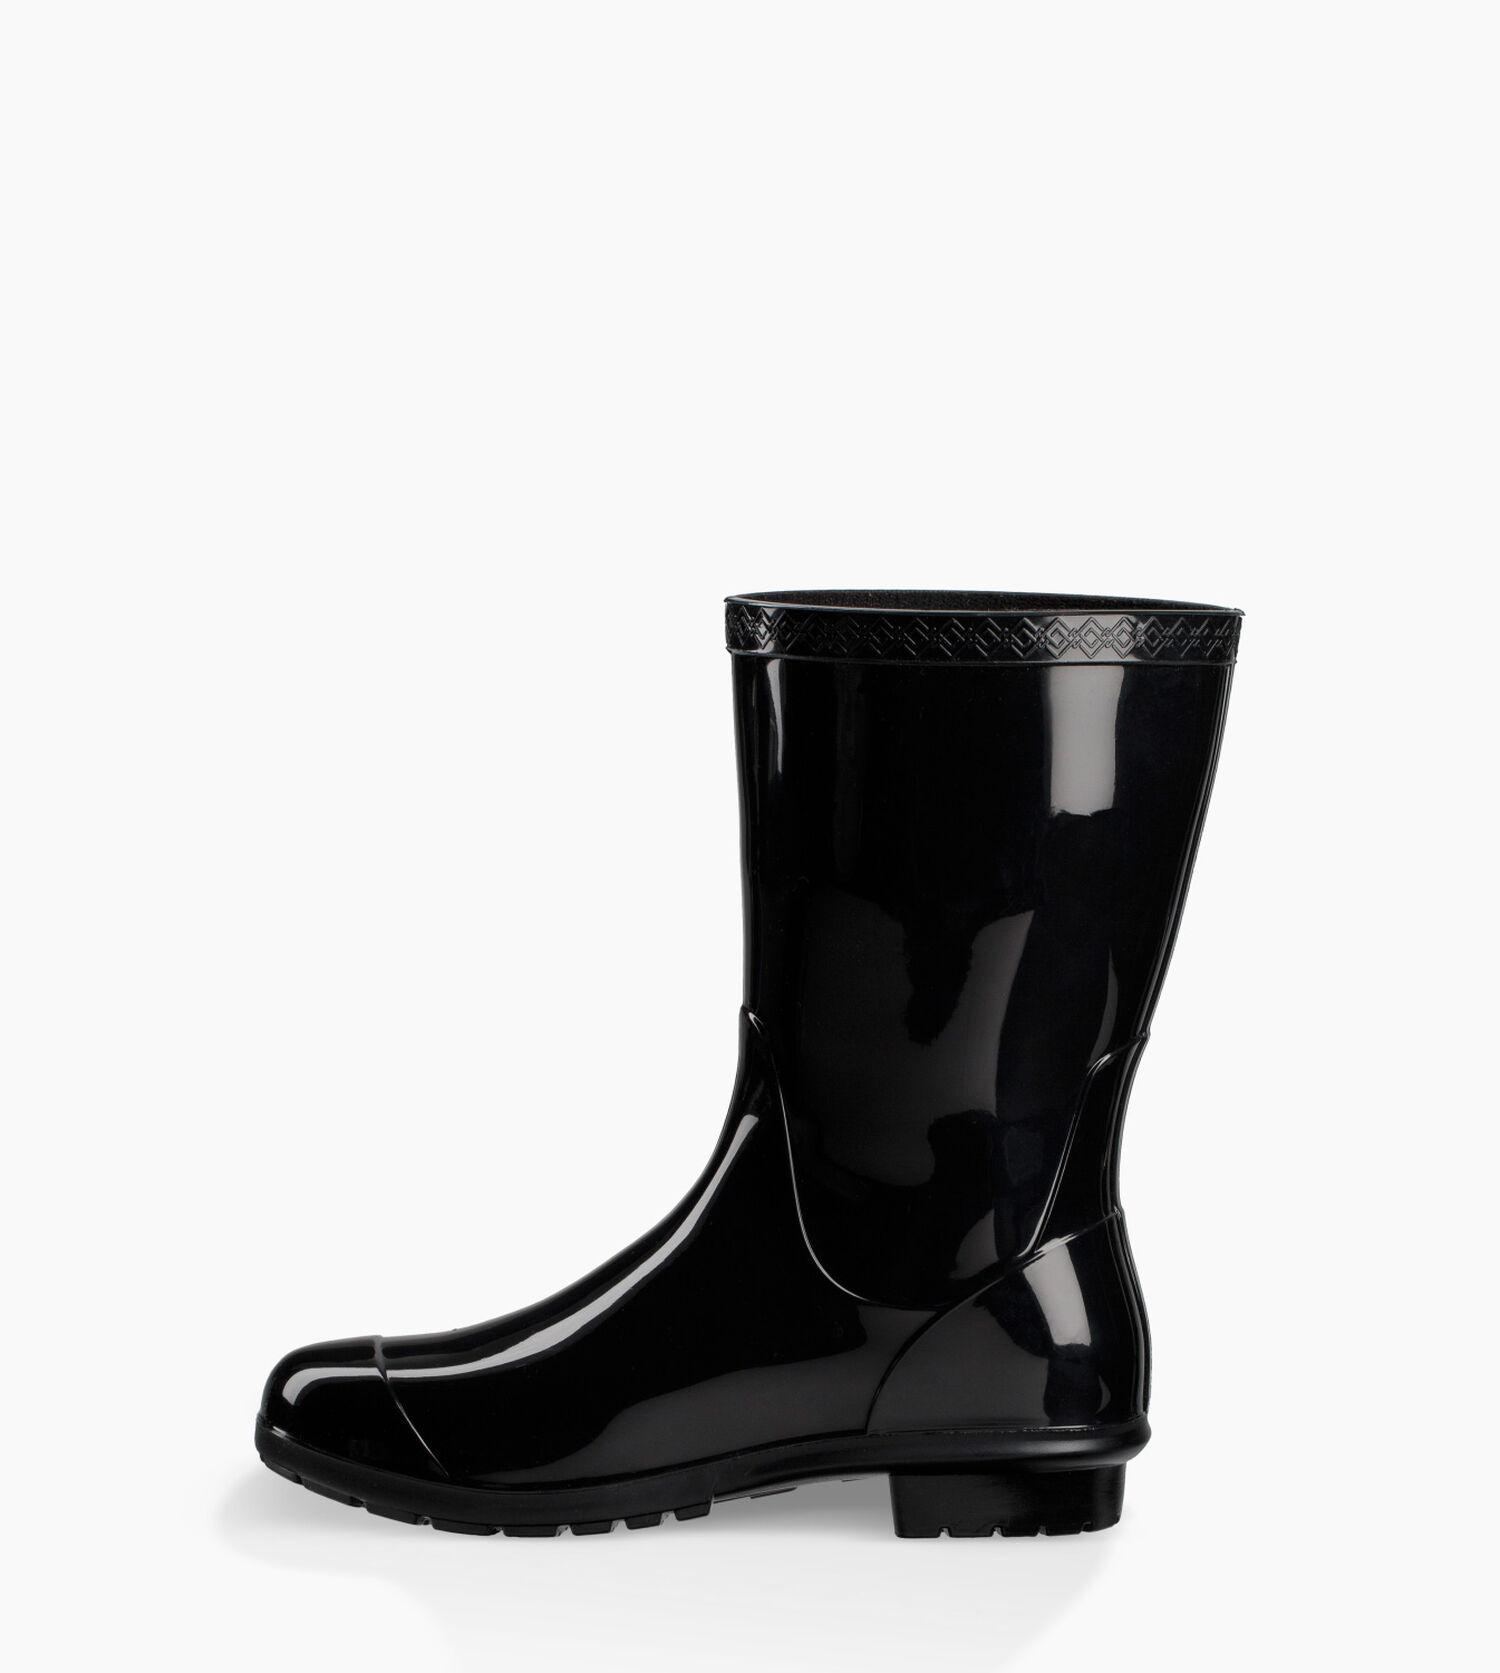 bdb3b0300a2 Women's Share this product Sienna Rain Boot